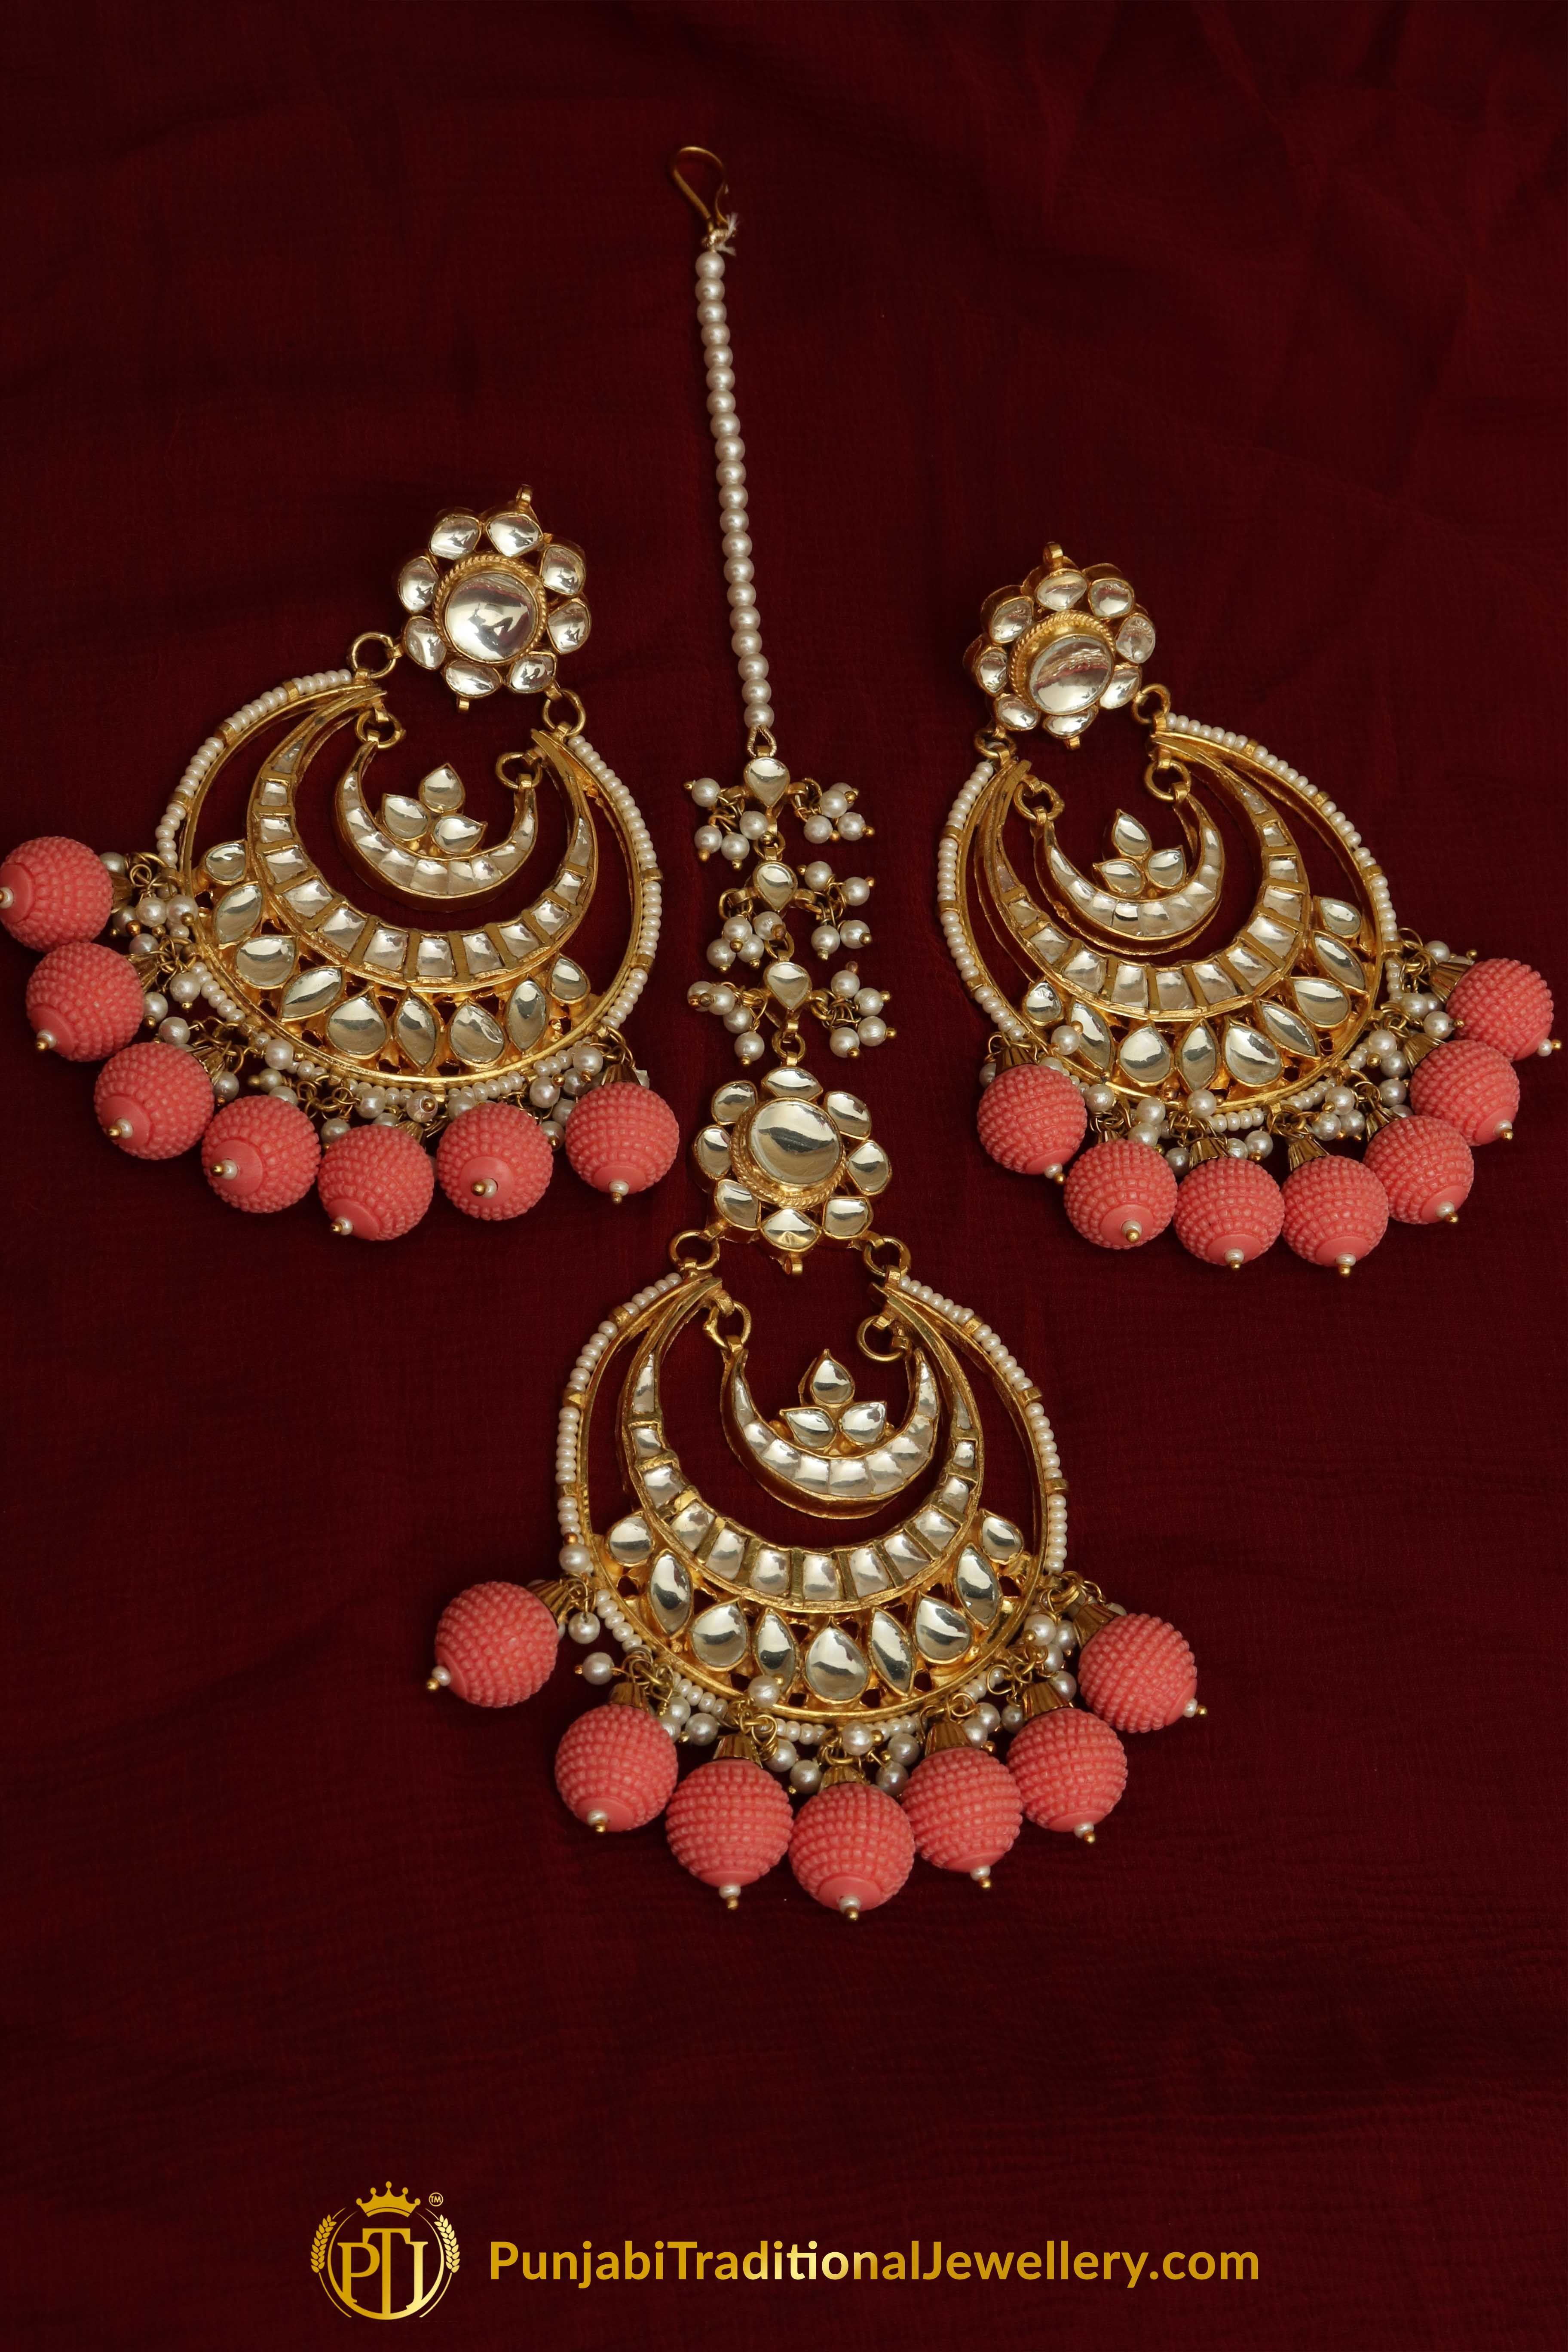 1f90364111 Punjabi Traditional Jewellery · Pinterest: @PunjabiJewellery Pink Kundan  Earring Tikka Set You may visit: http:/